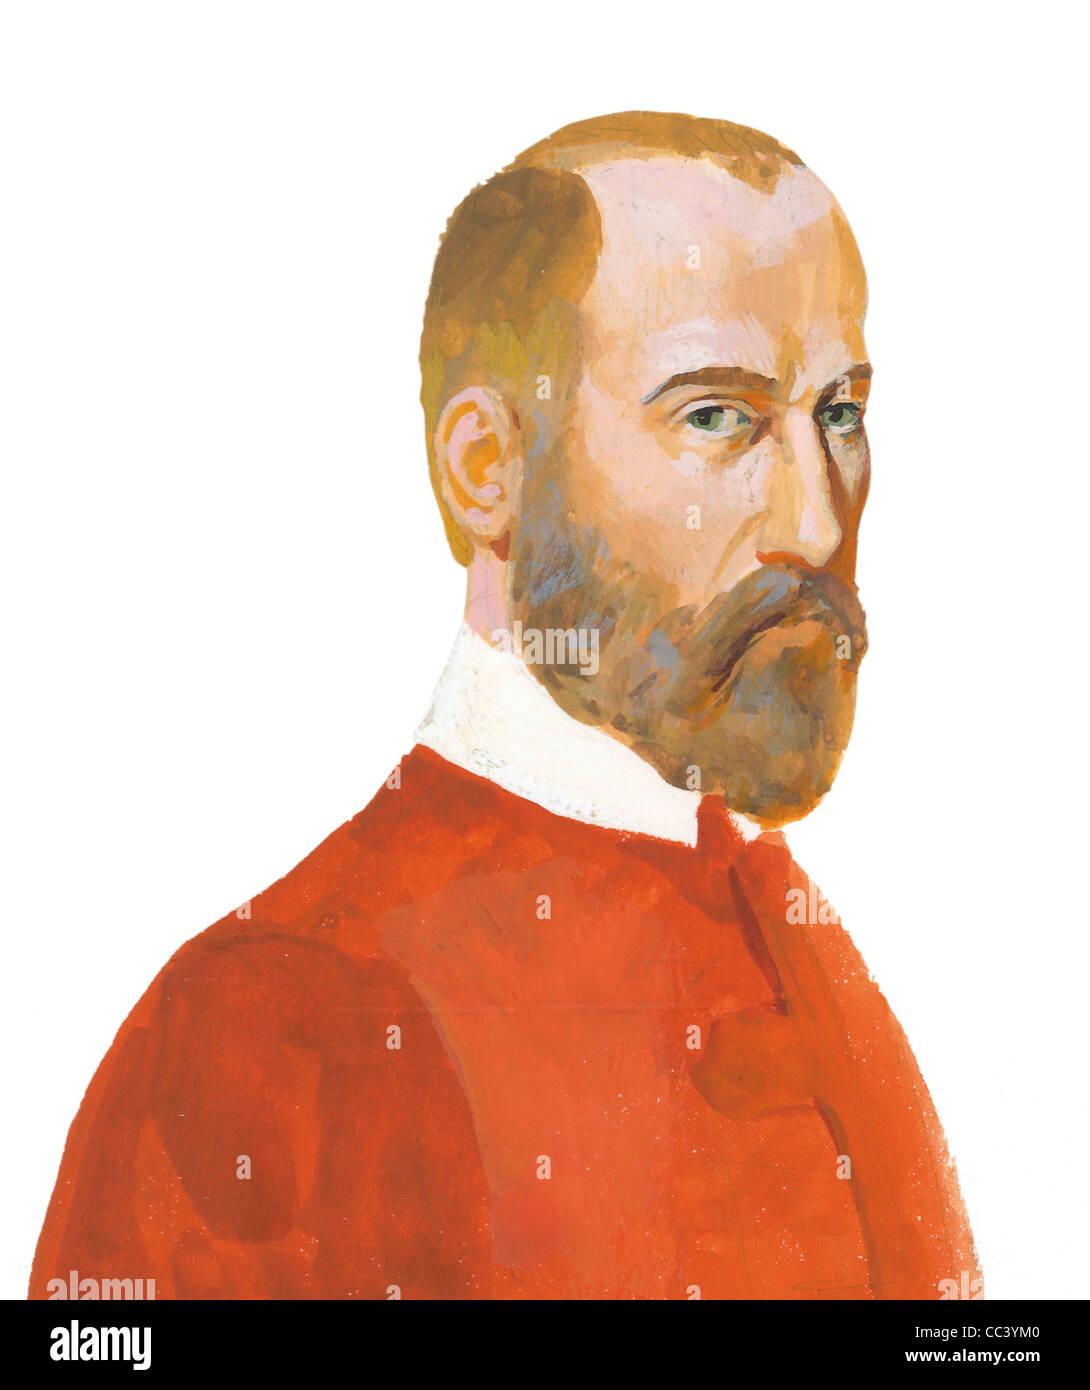 Italian 16th Century - Giovanni Pierluigi Da Palestrina (1525-94), Musician. Coffee Painting. - Stock Image